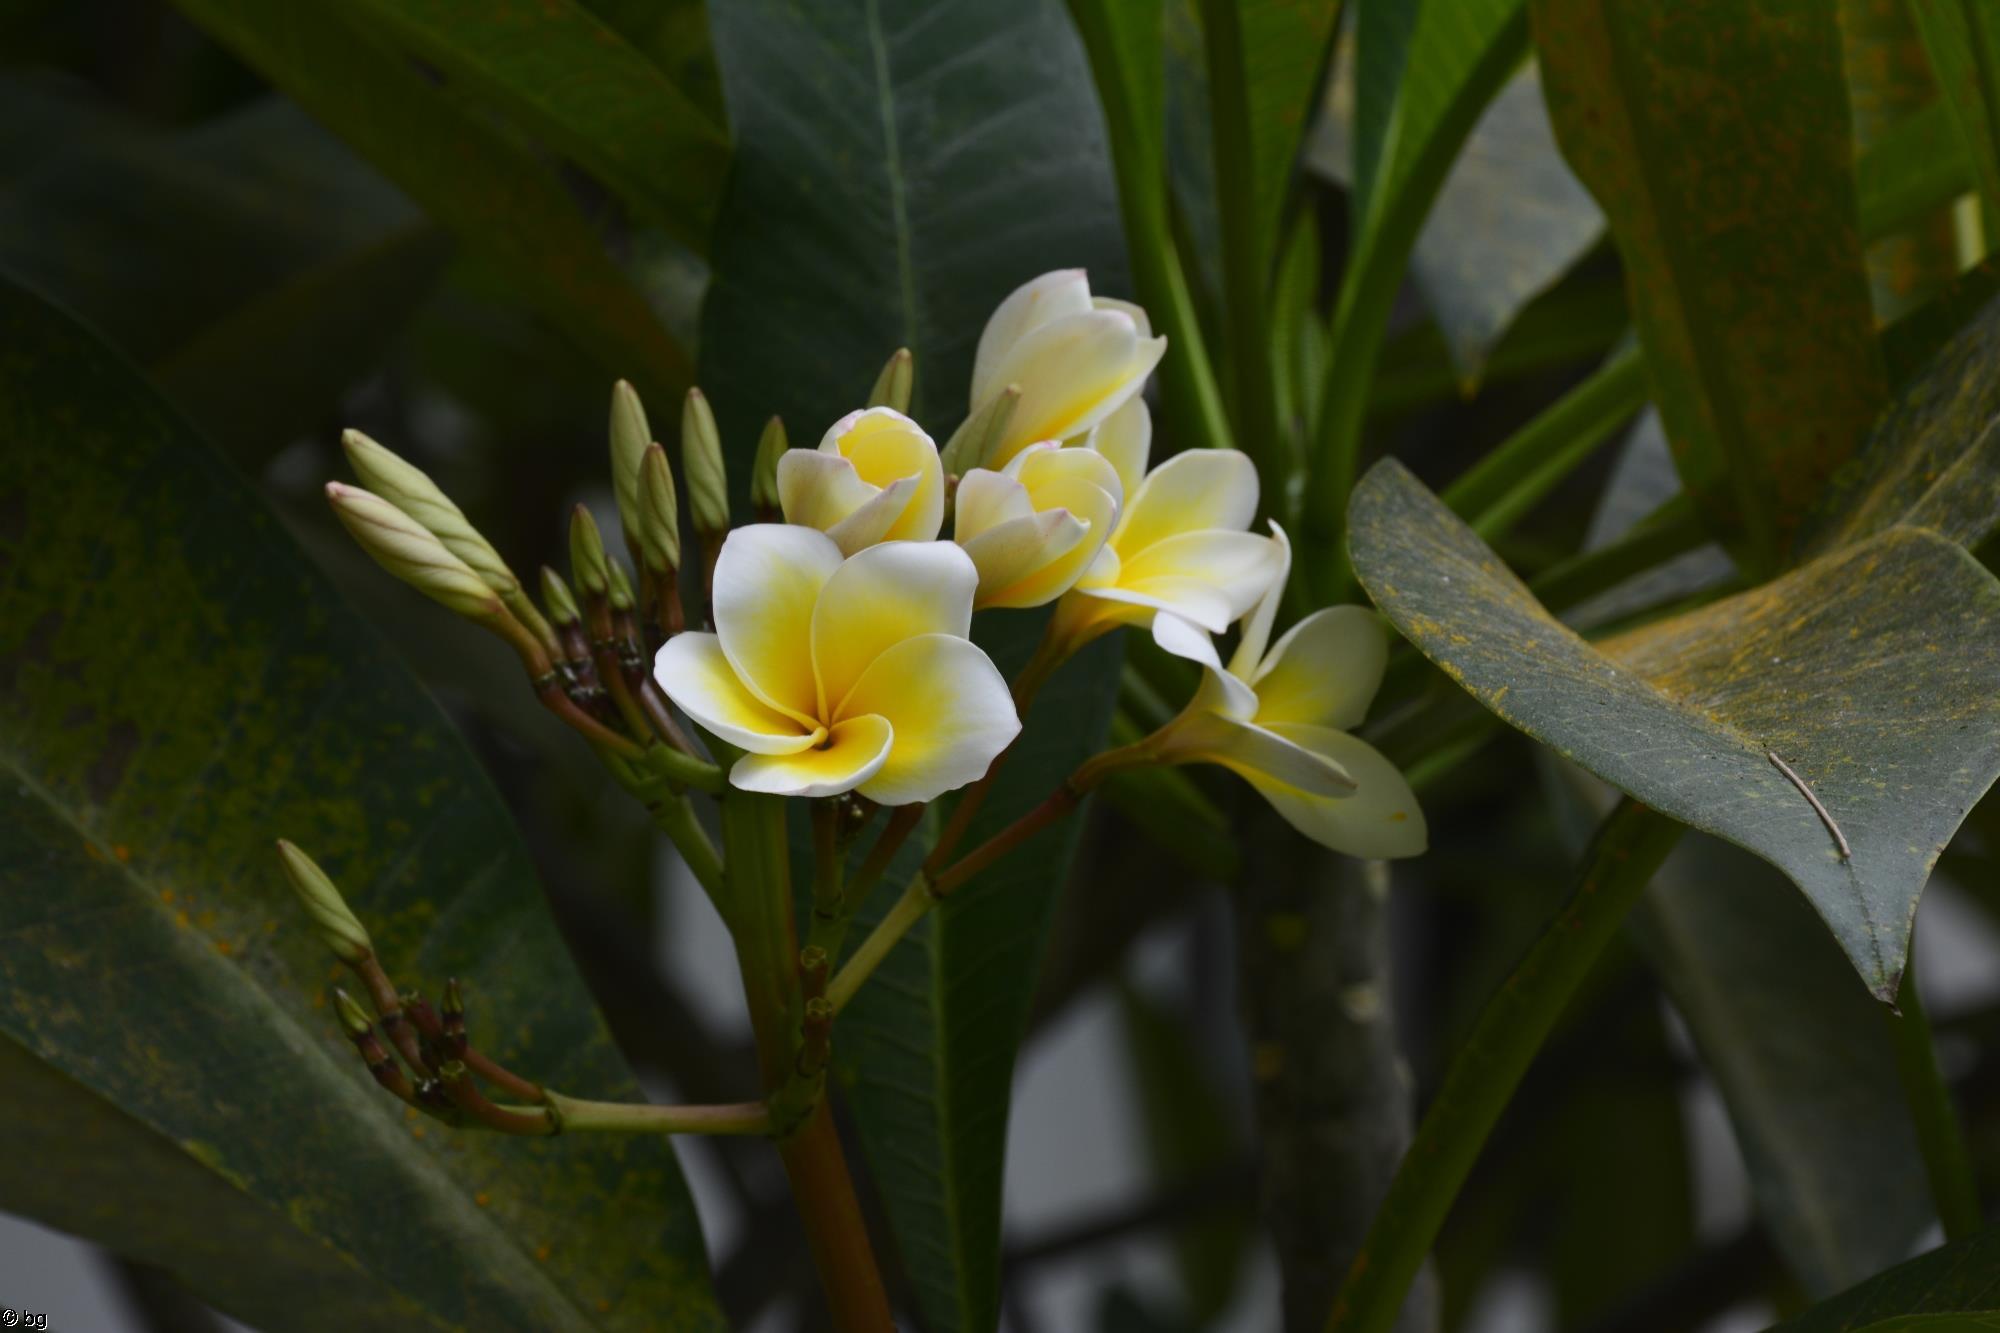 plante-grasse-fleur-jaune